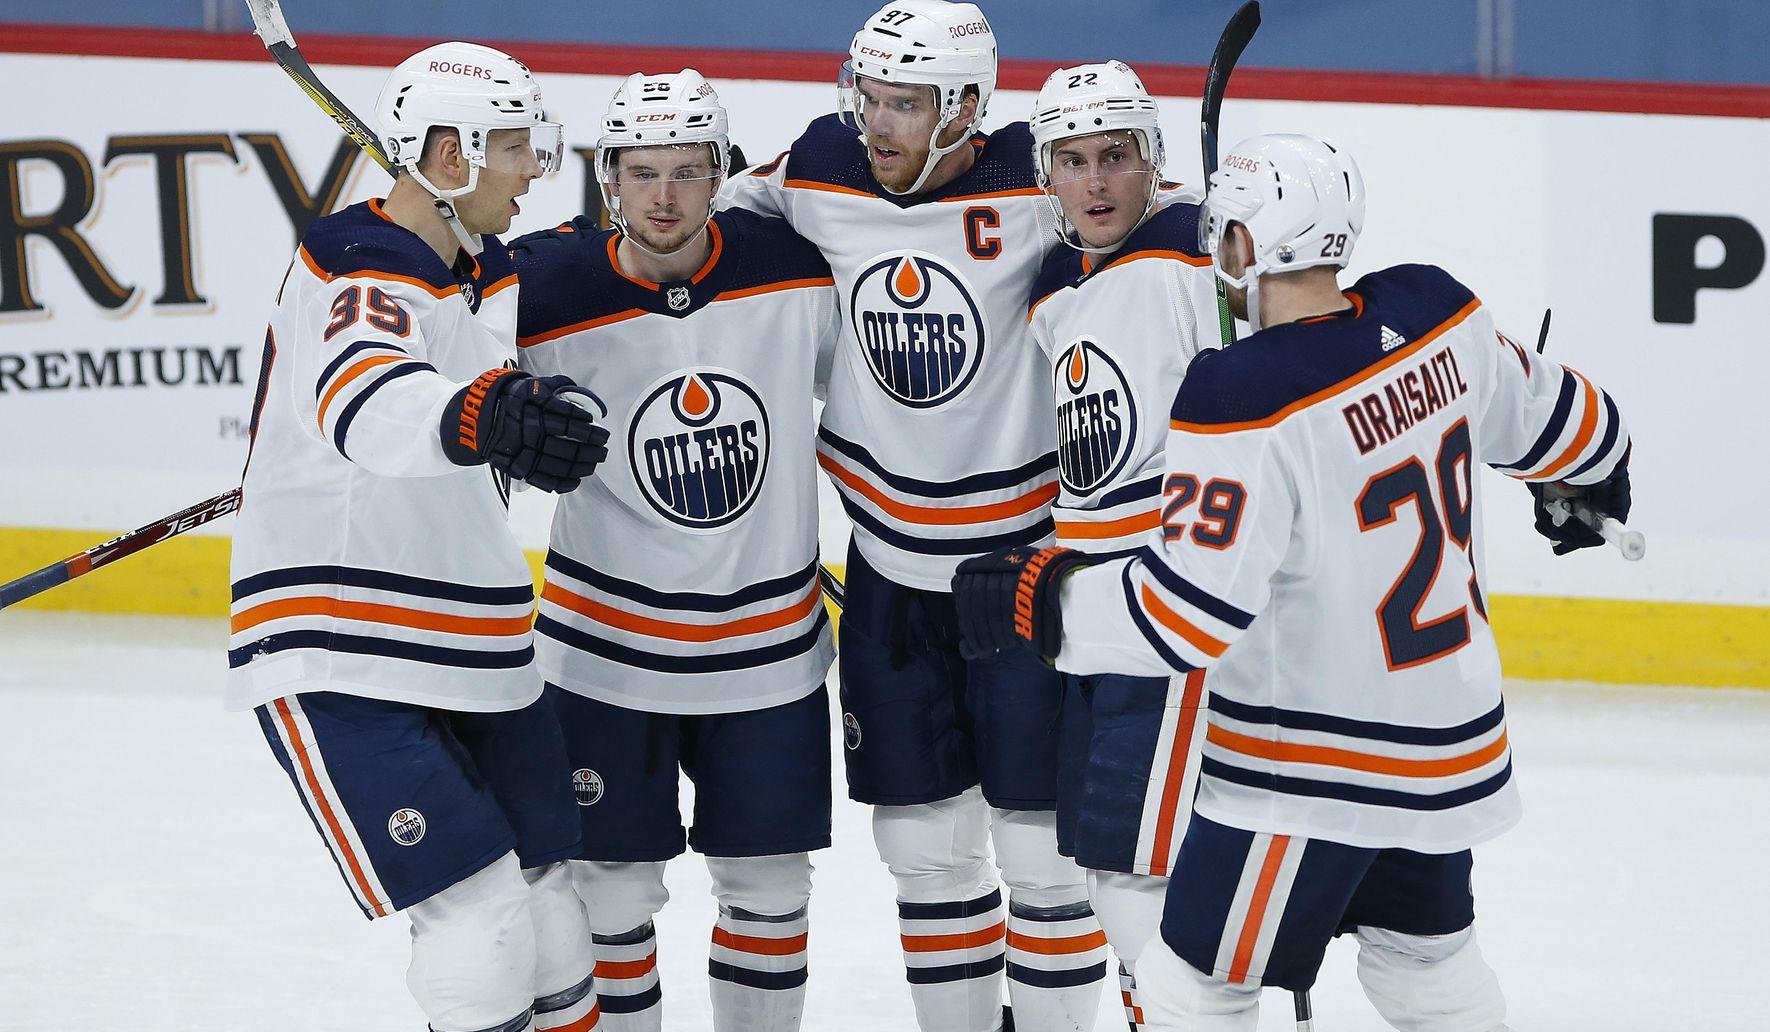 Oilers_jets_hockey_39315_c0-163-3900-2436_s1770x1032